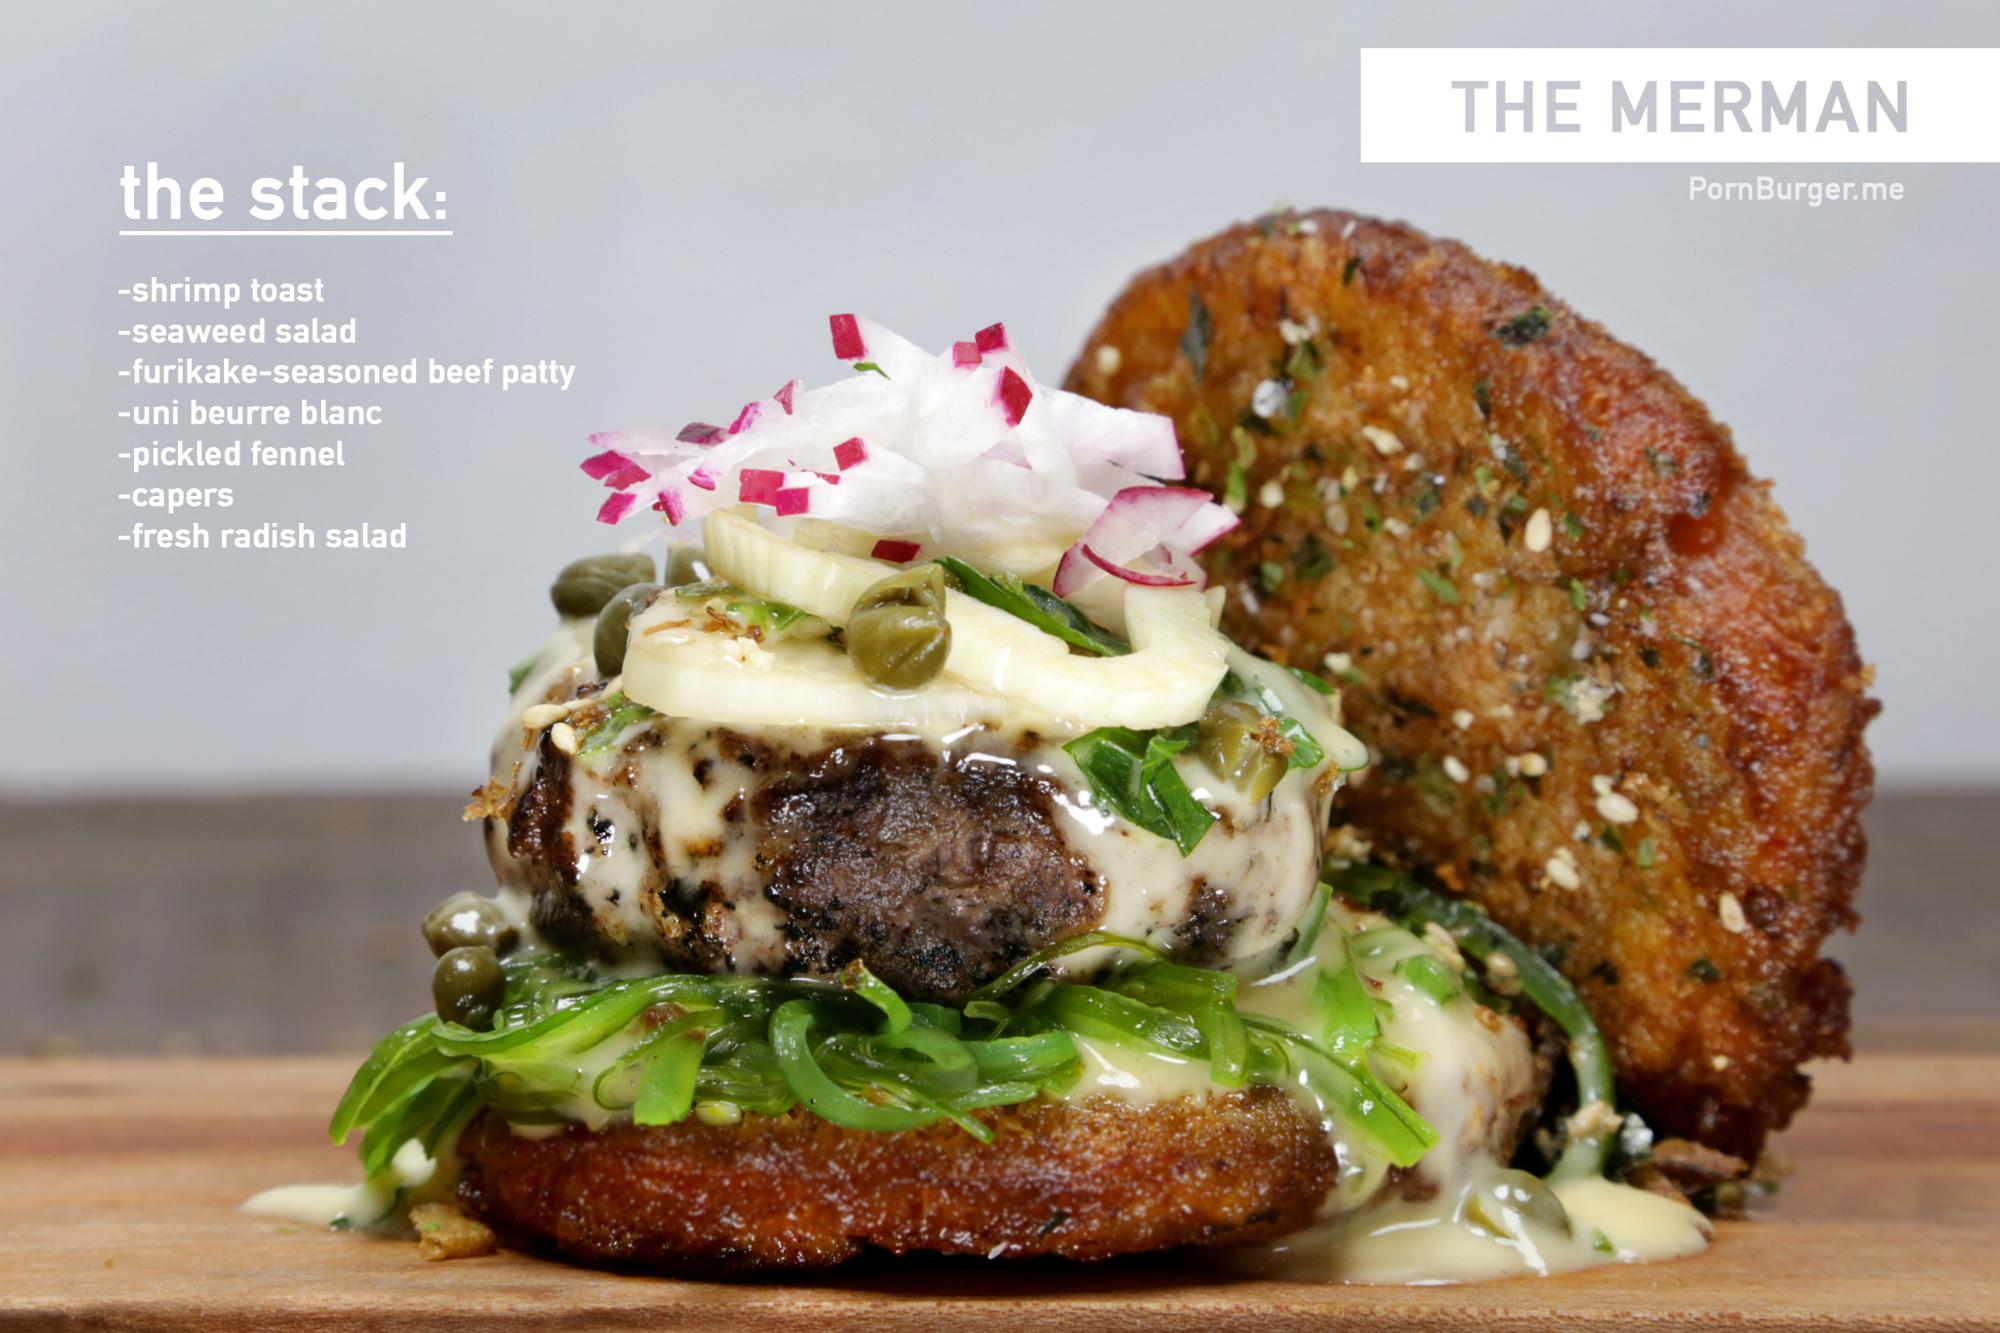 The Merman Burger